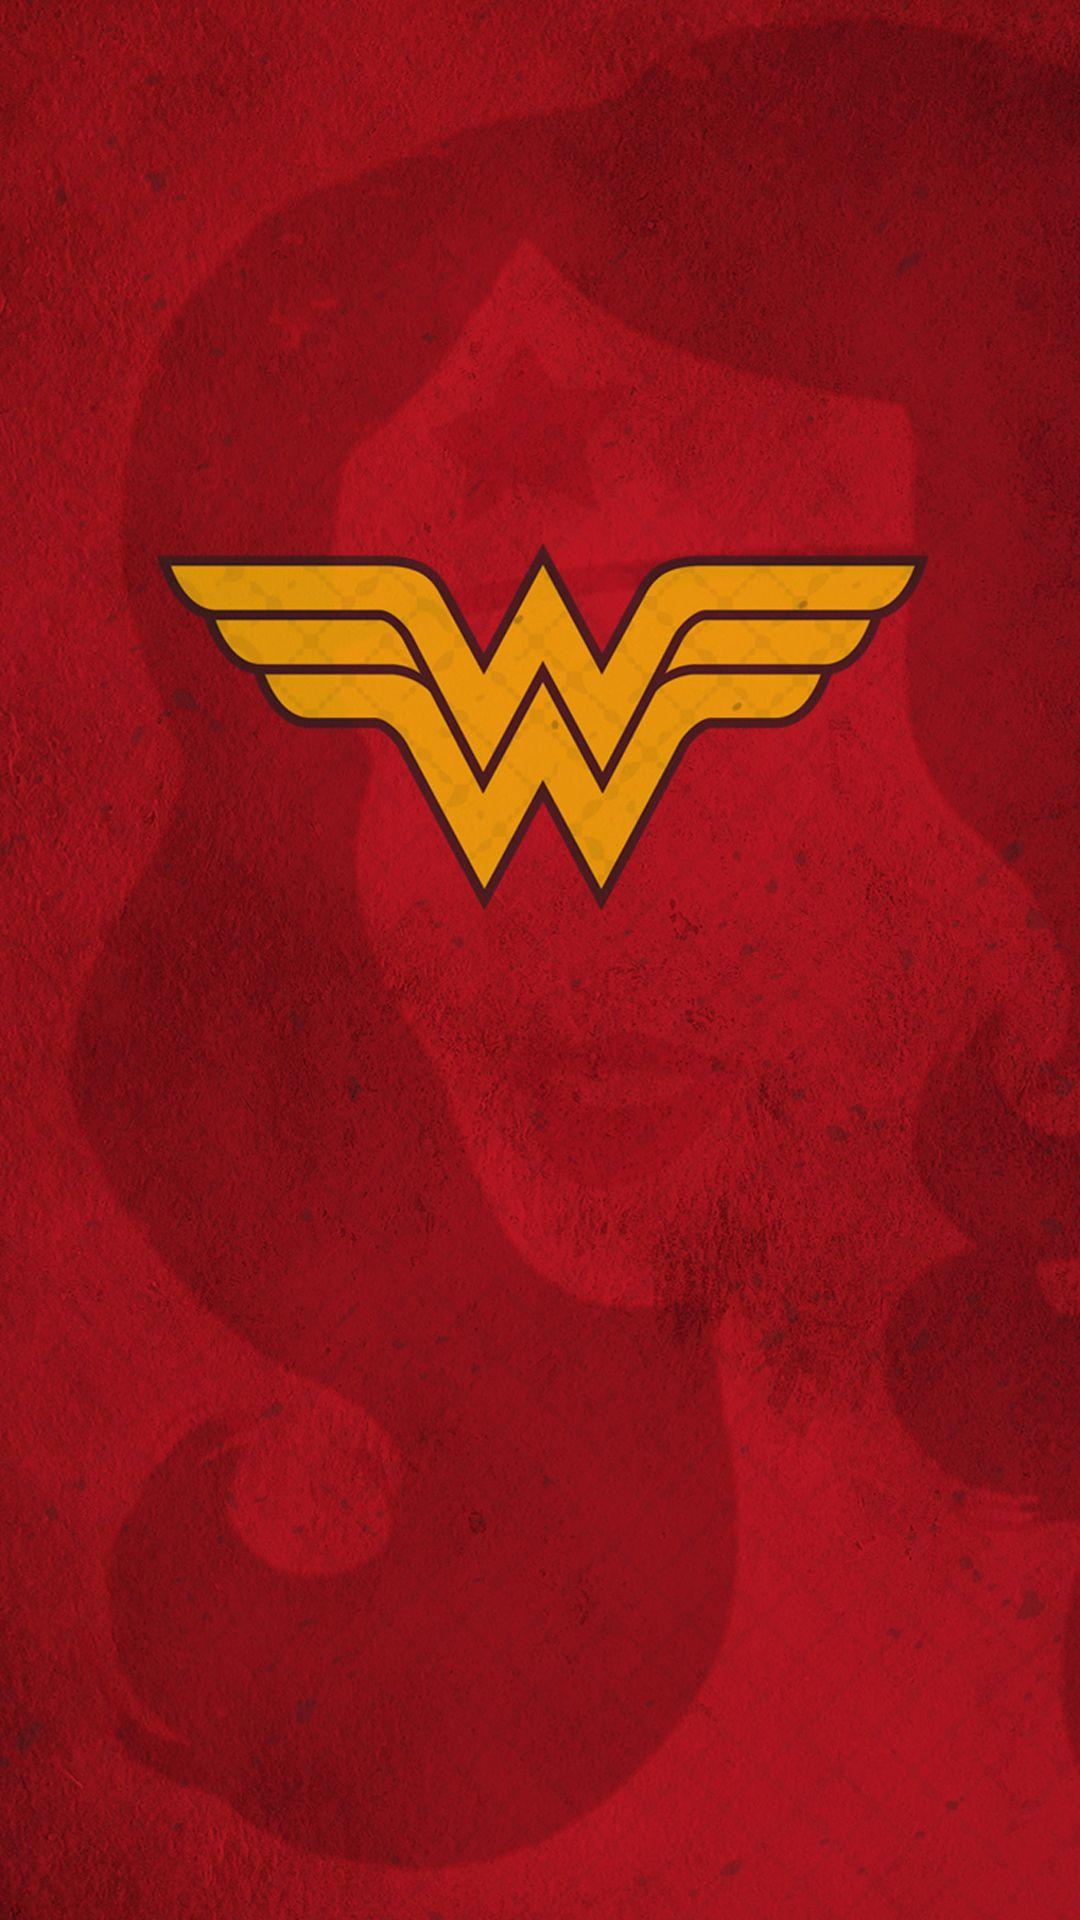 Wonder Woman 01 Iphone 6 Plus Hero Wallpaper Wonder Woman